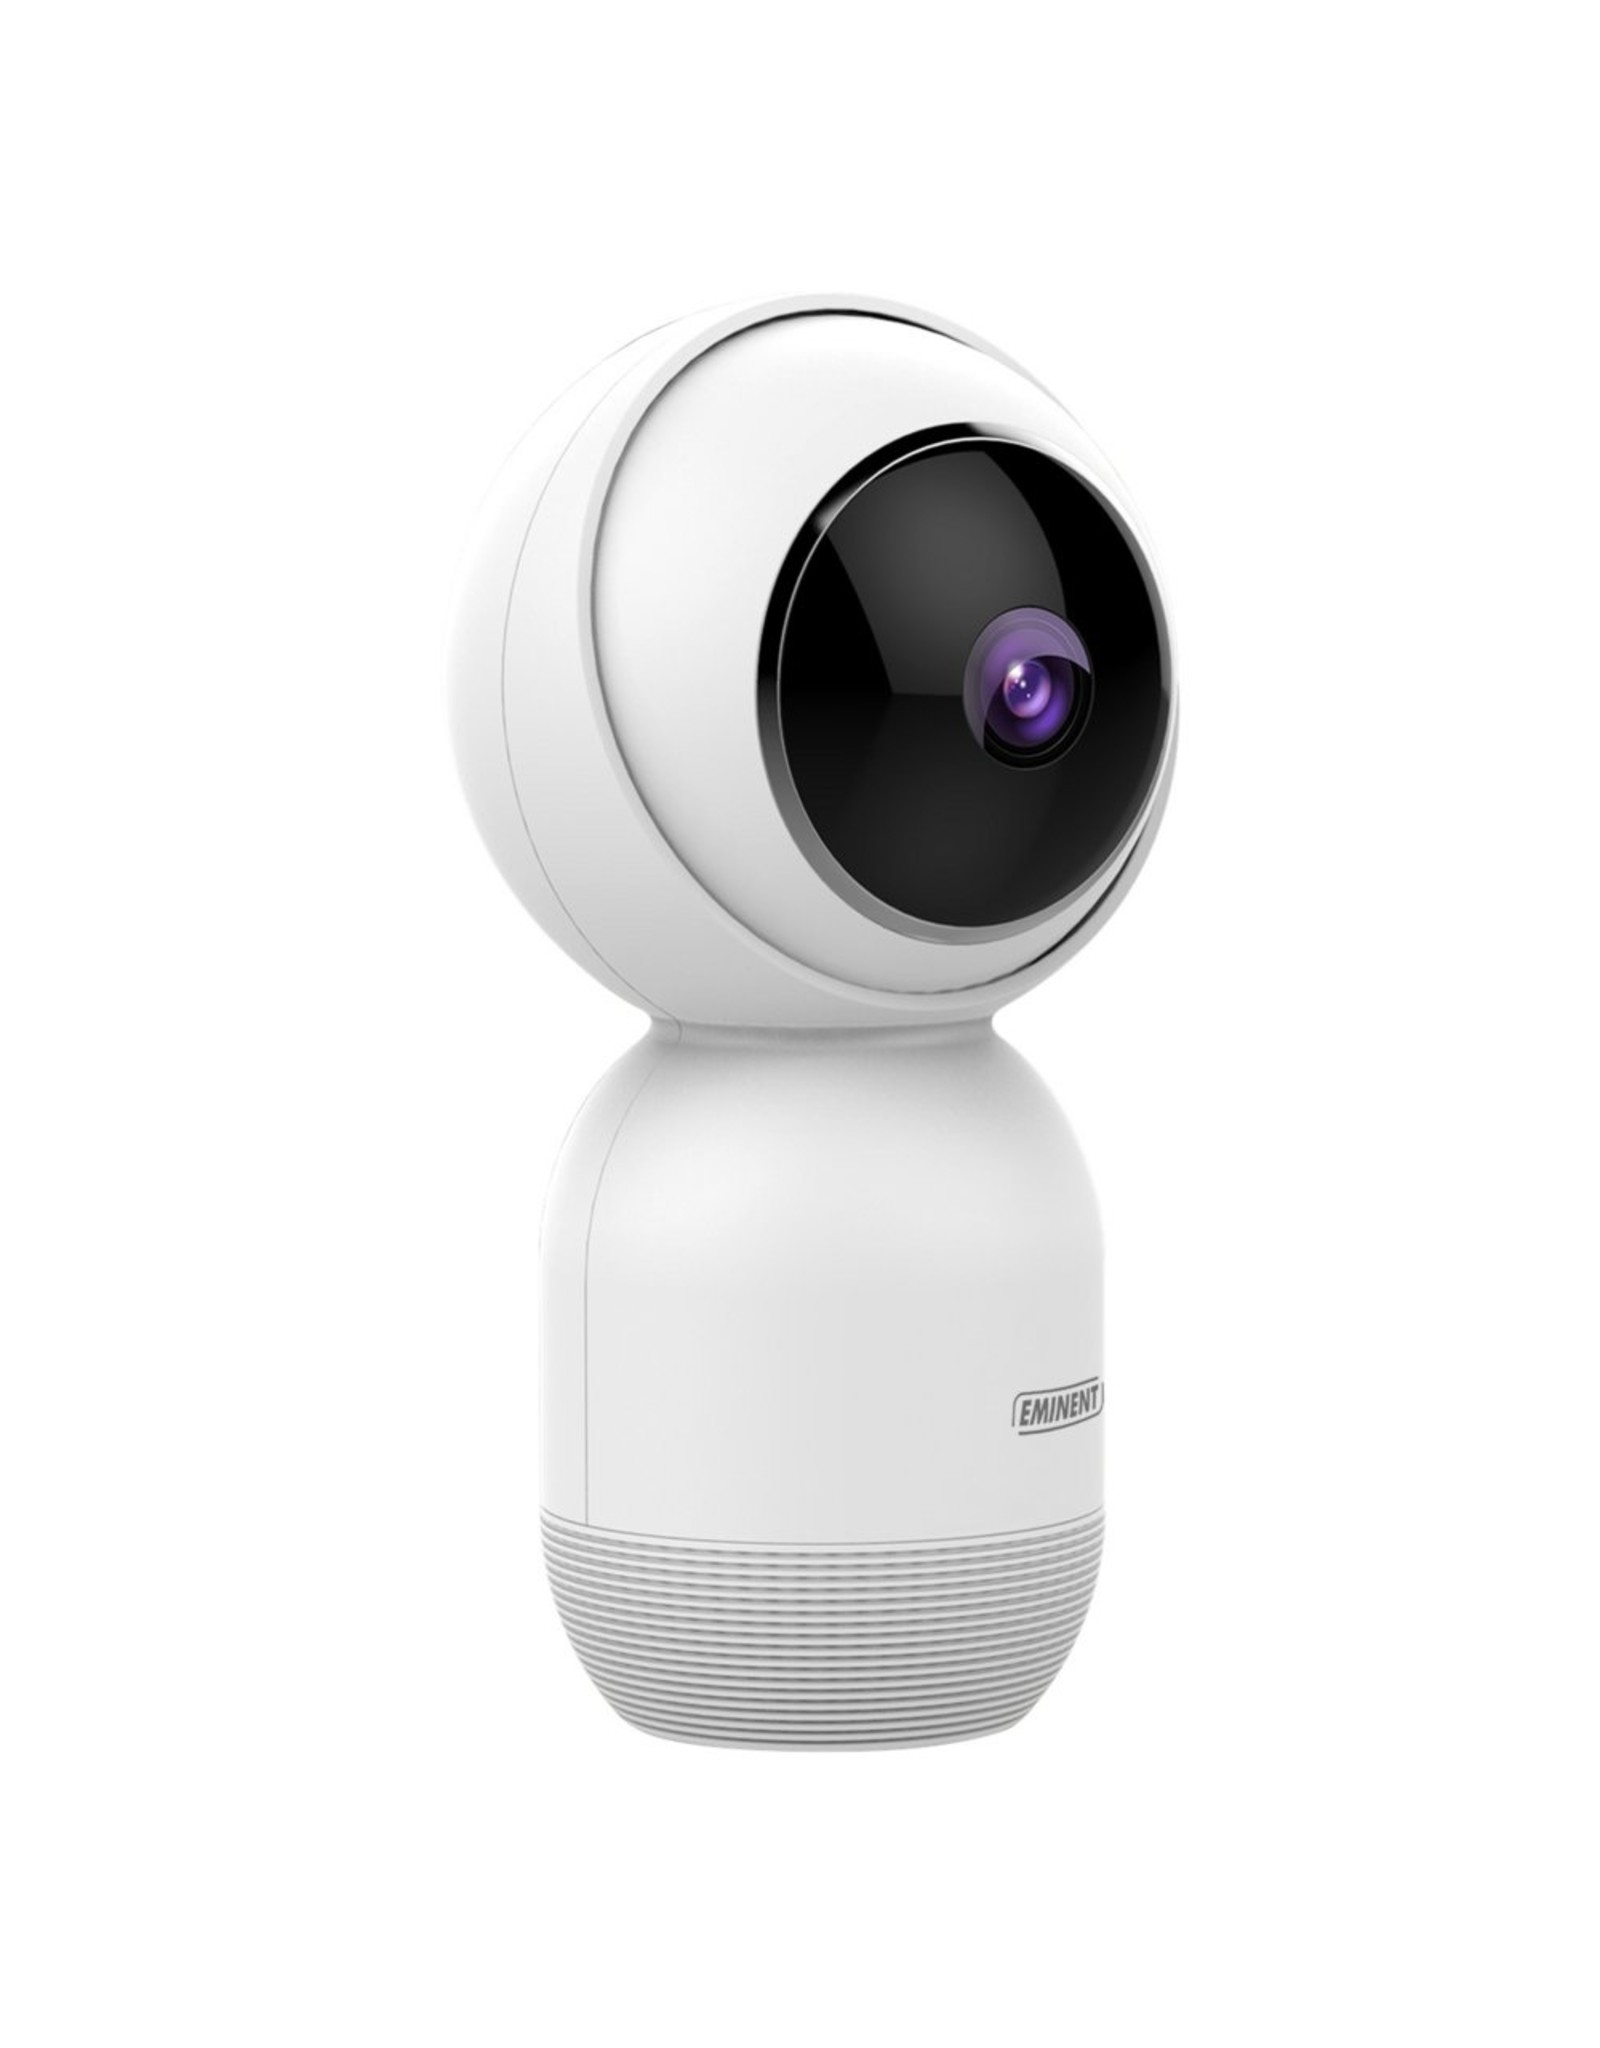 Eminent E-SmartLife Wireless Full HD IP Cam Pan/Tilt with SD